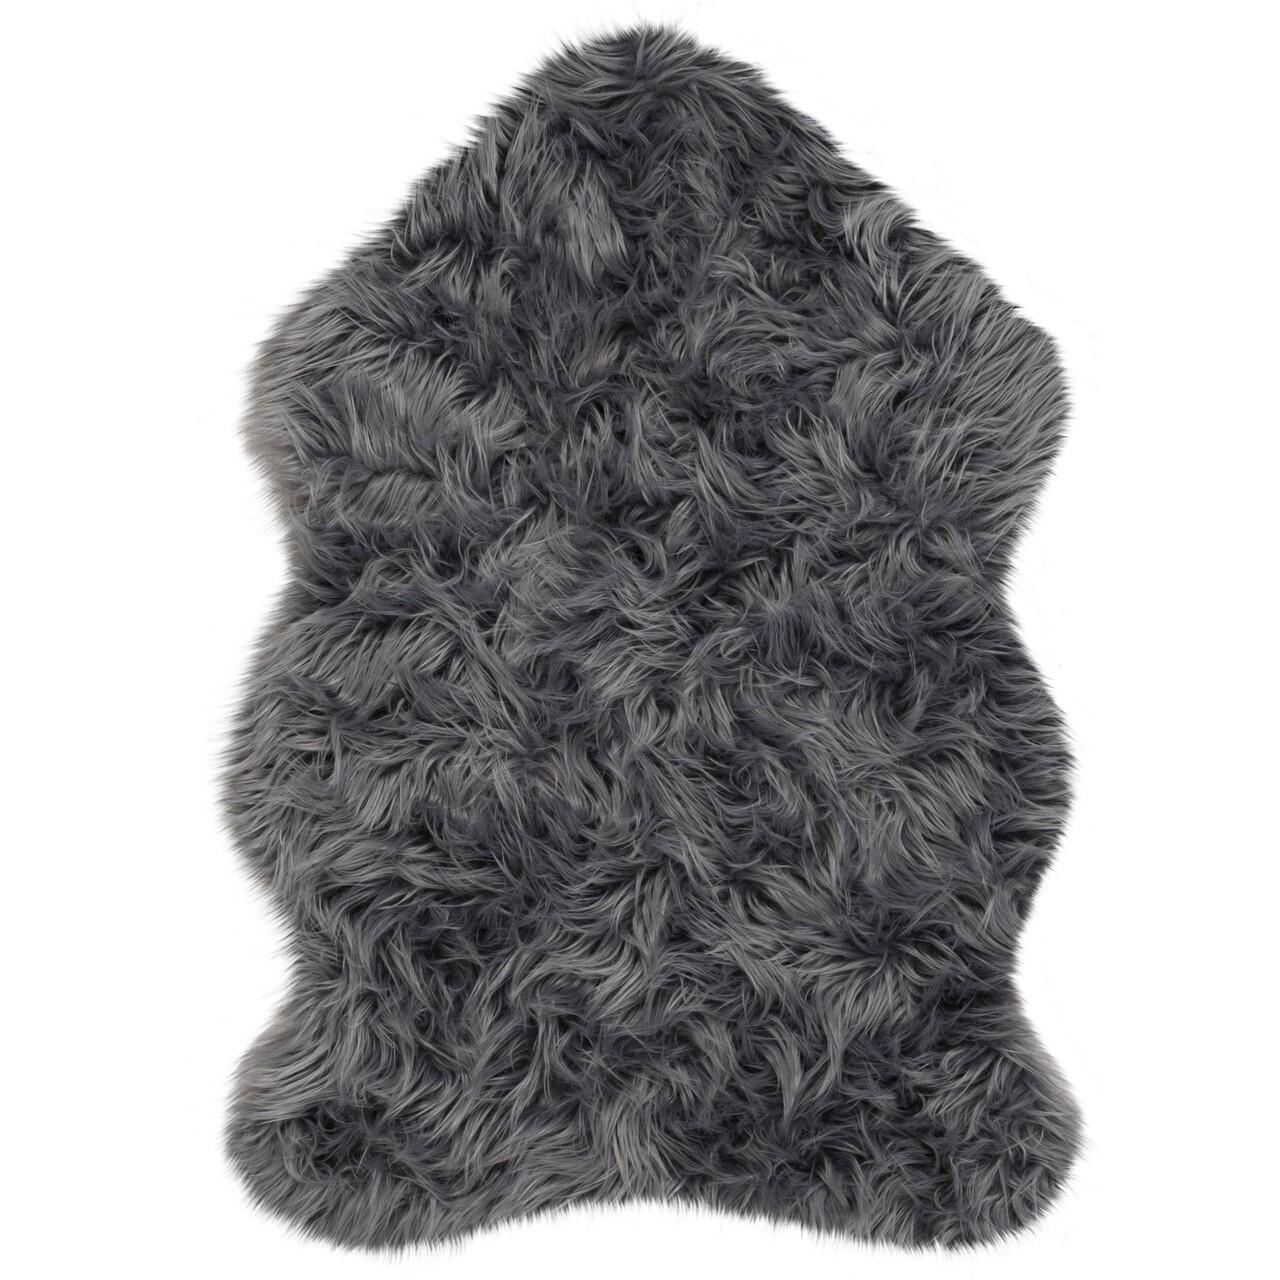 Covor Sheepskin Charcoal, Flair Rugs, 70 x 140 cm, poliester, gri